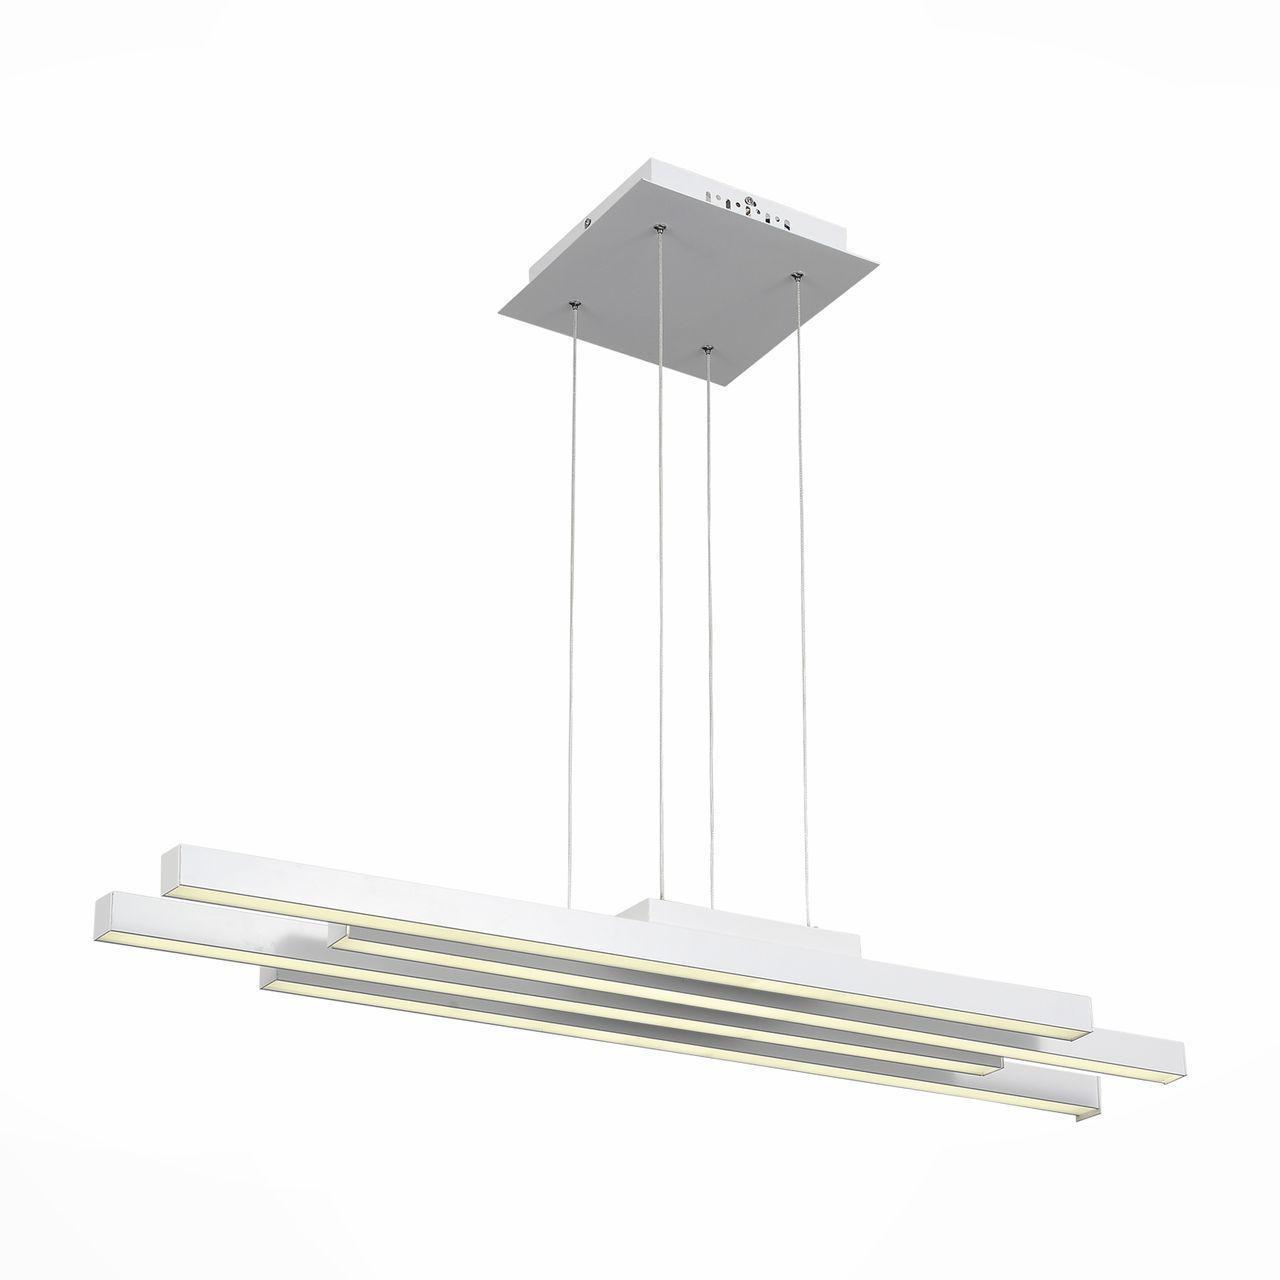 Фото - Подвесной светильник ST Luce SL933.503.04, белый светильник подвесной st luce trina sl274 503 03 3xe27x40w 50 x 50 x 138 см